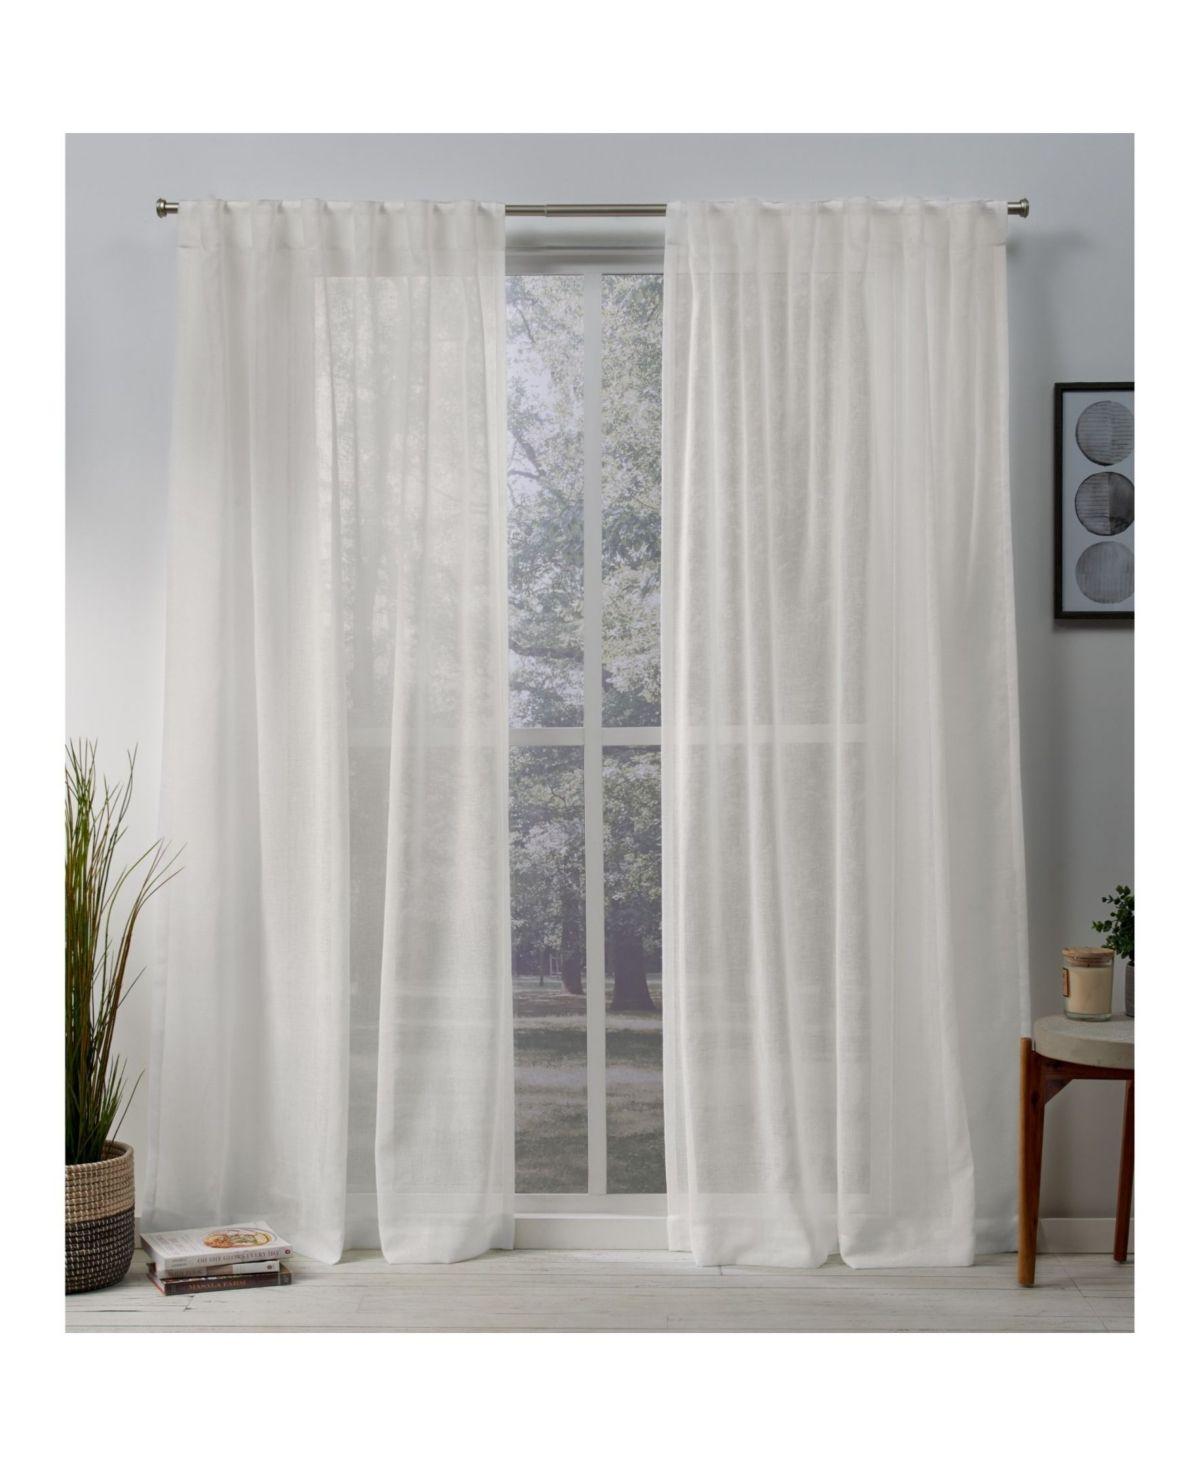 Exclusive Home Belgian Sheer Hidden Tab Top Curtain Panel Pair 50